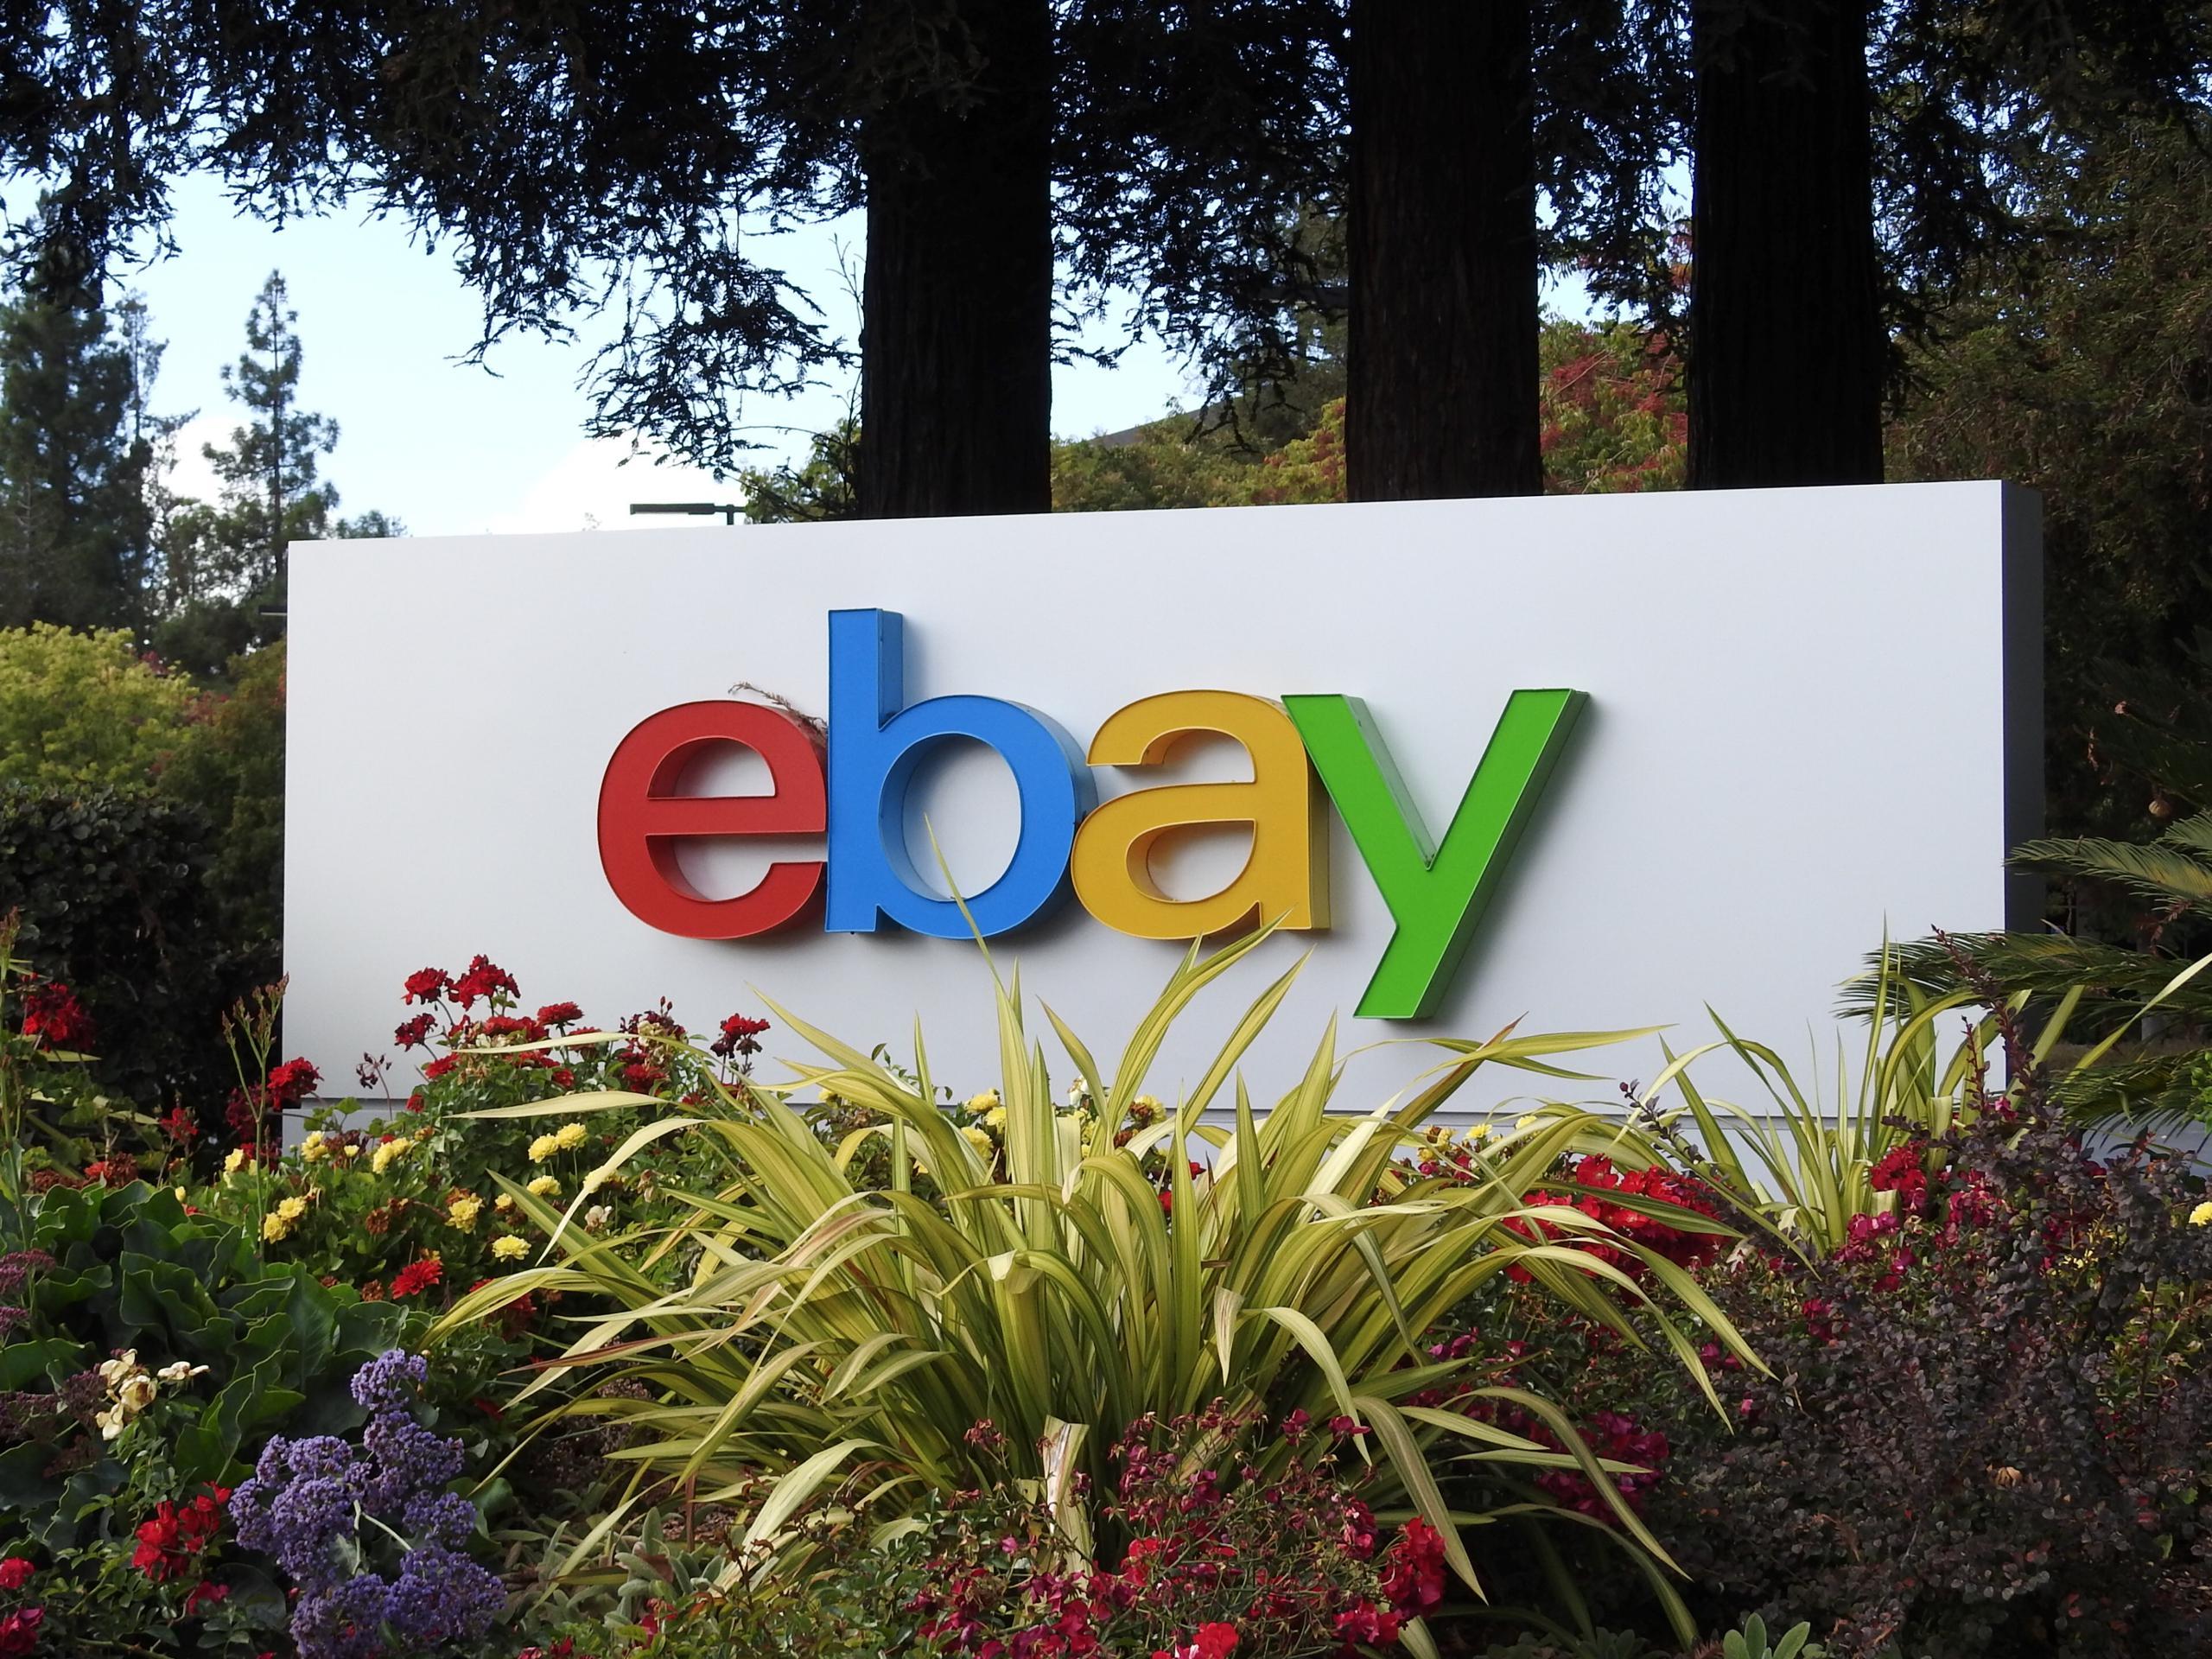 Entrance to eBay's corporate headquarters in San Jose, California.